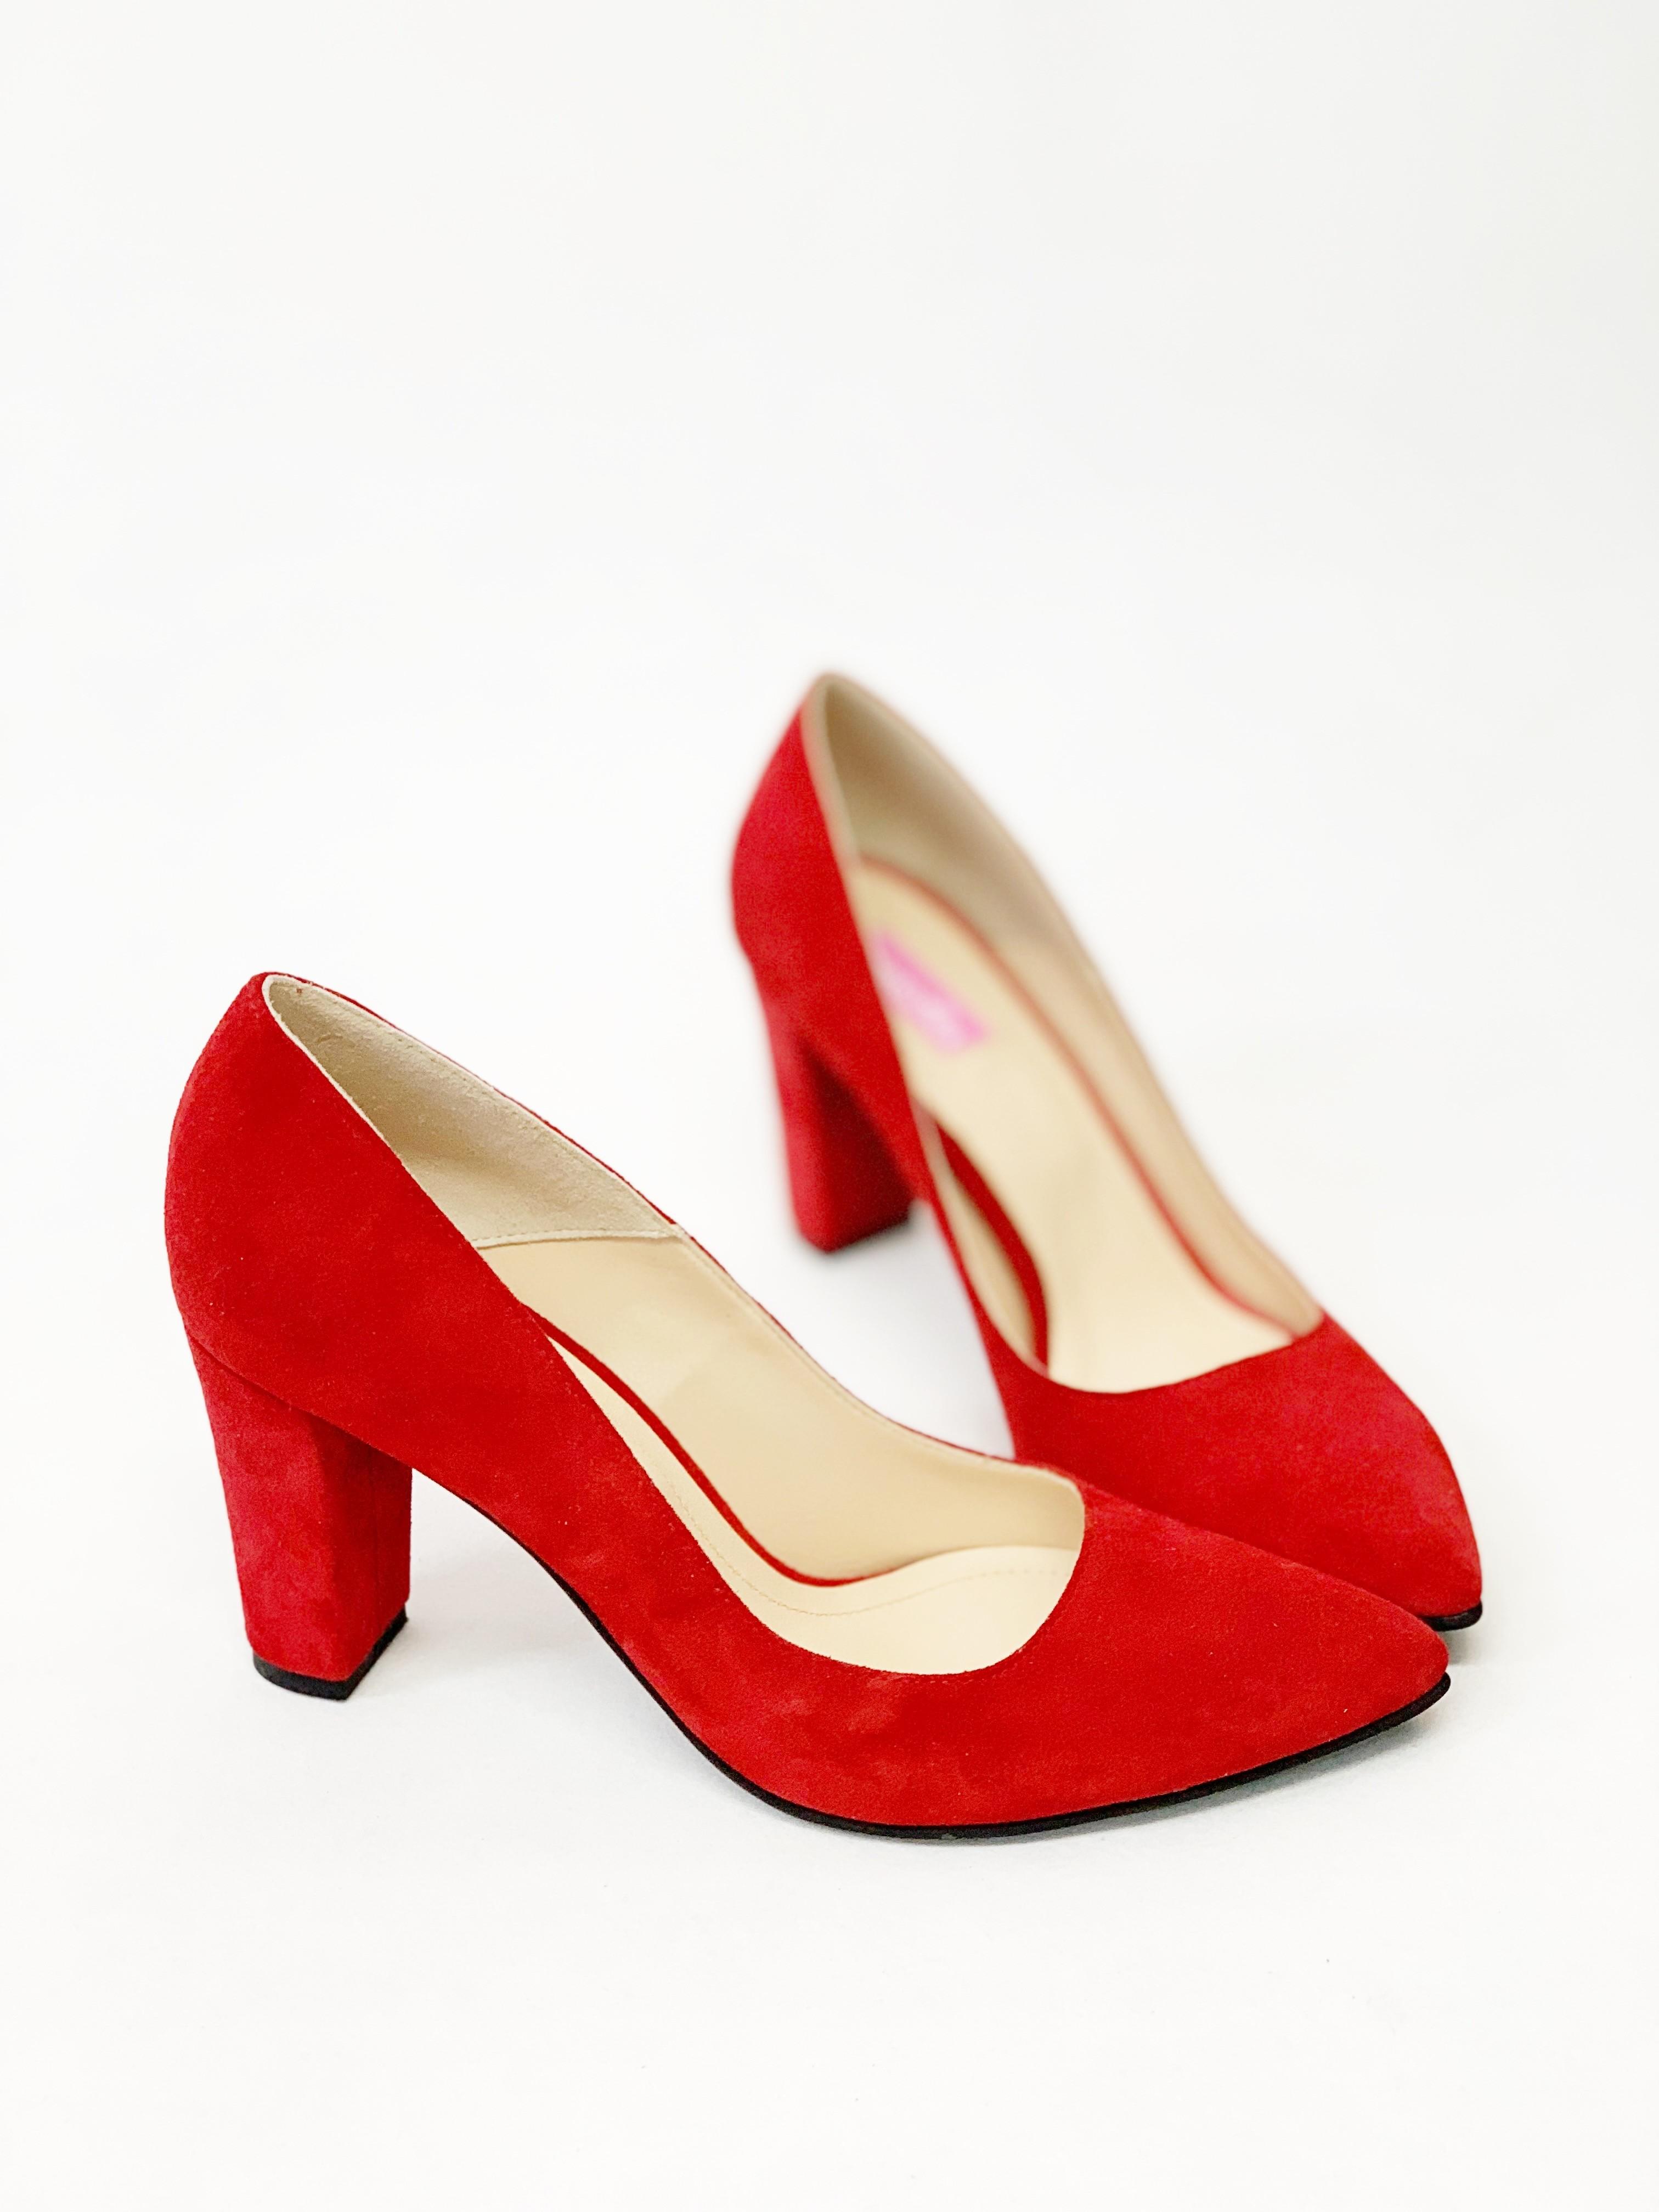 Pantofi Comfy Stiletto